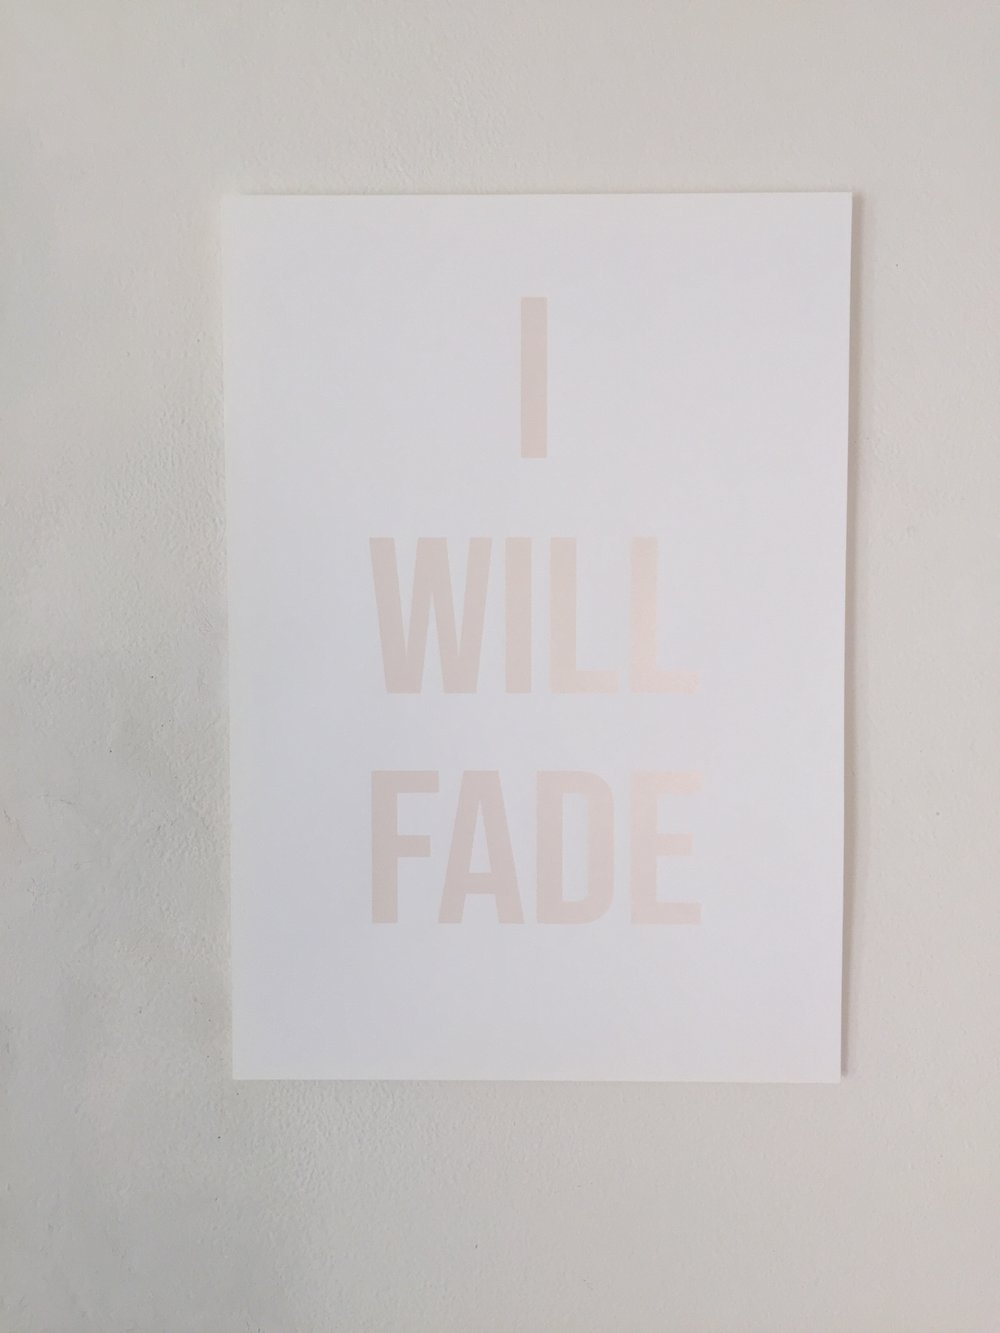 I WILL FADE  2018 / Screen print · Edition of 15 prints · Fabiano Academia 350grs · 50cm x 35 cm · Botanical ink: avocado and prunus cerasiferia